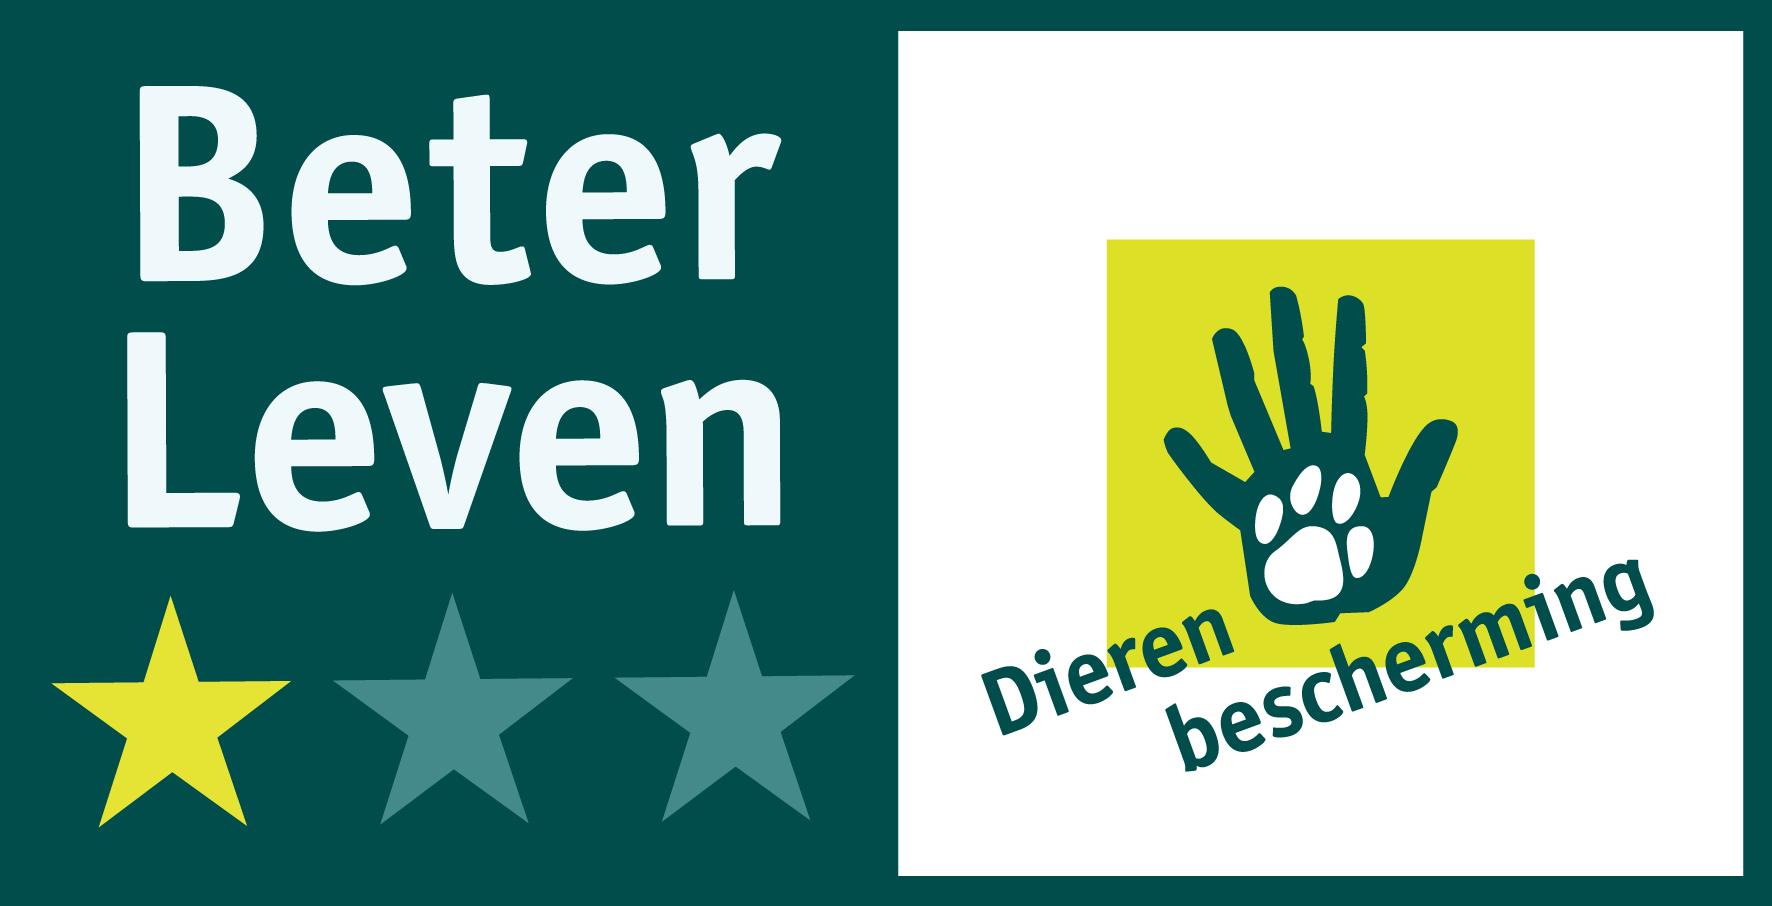 Beter-leven-logo